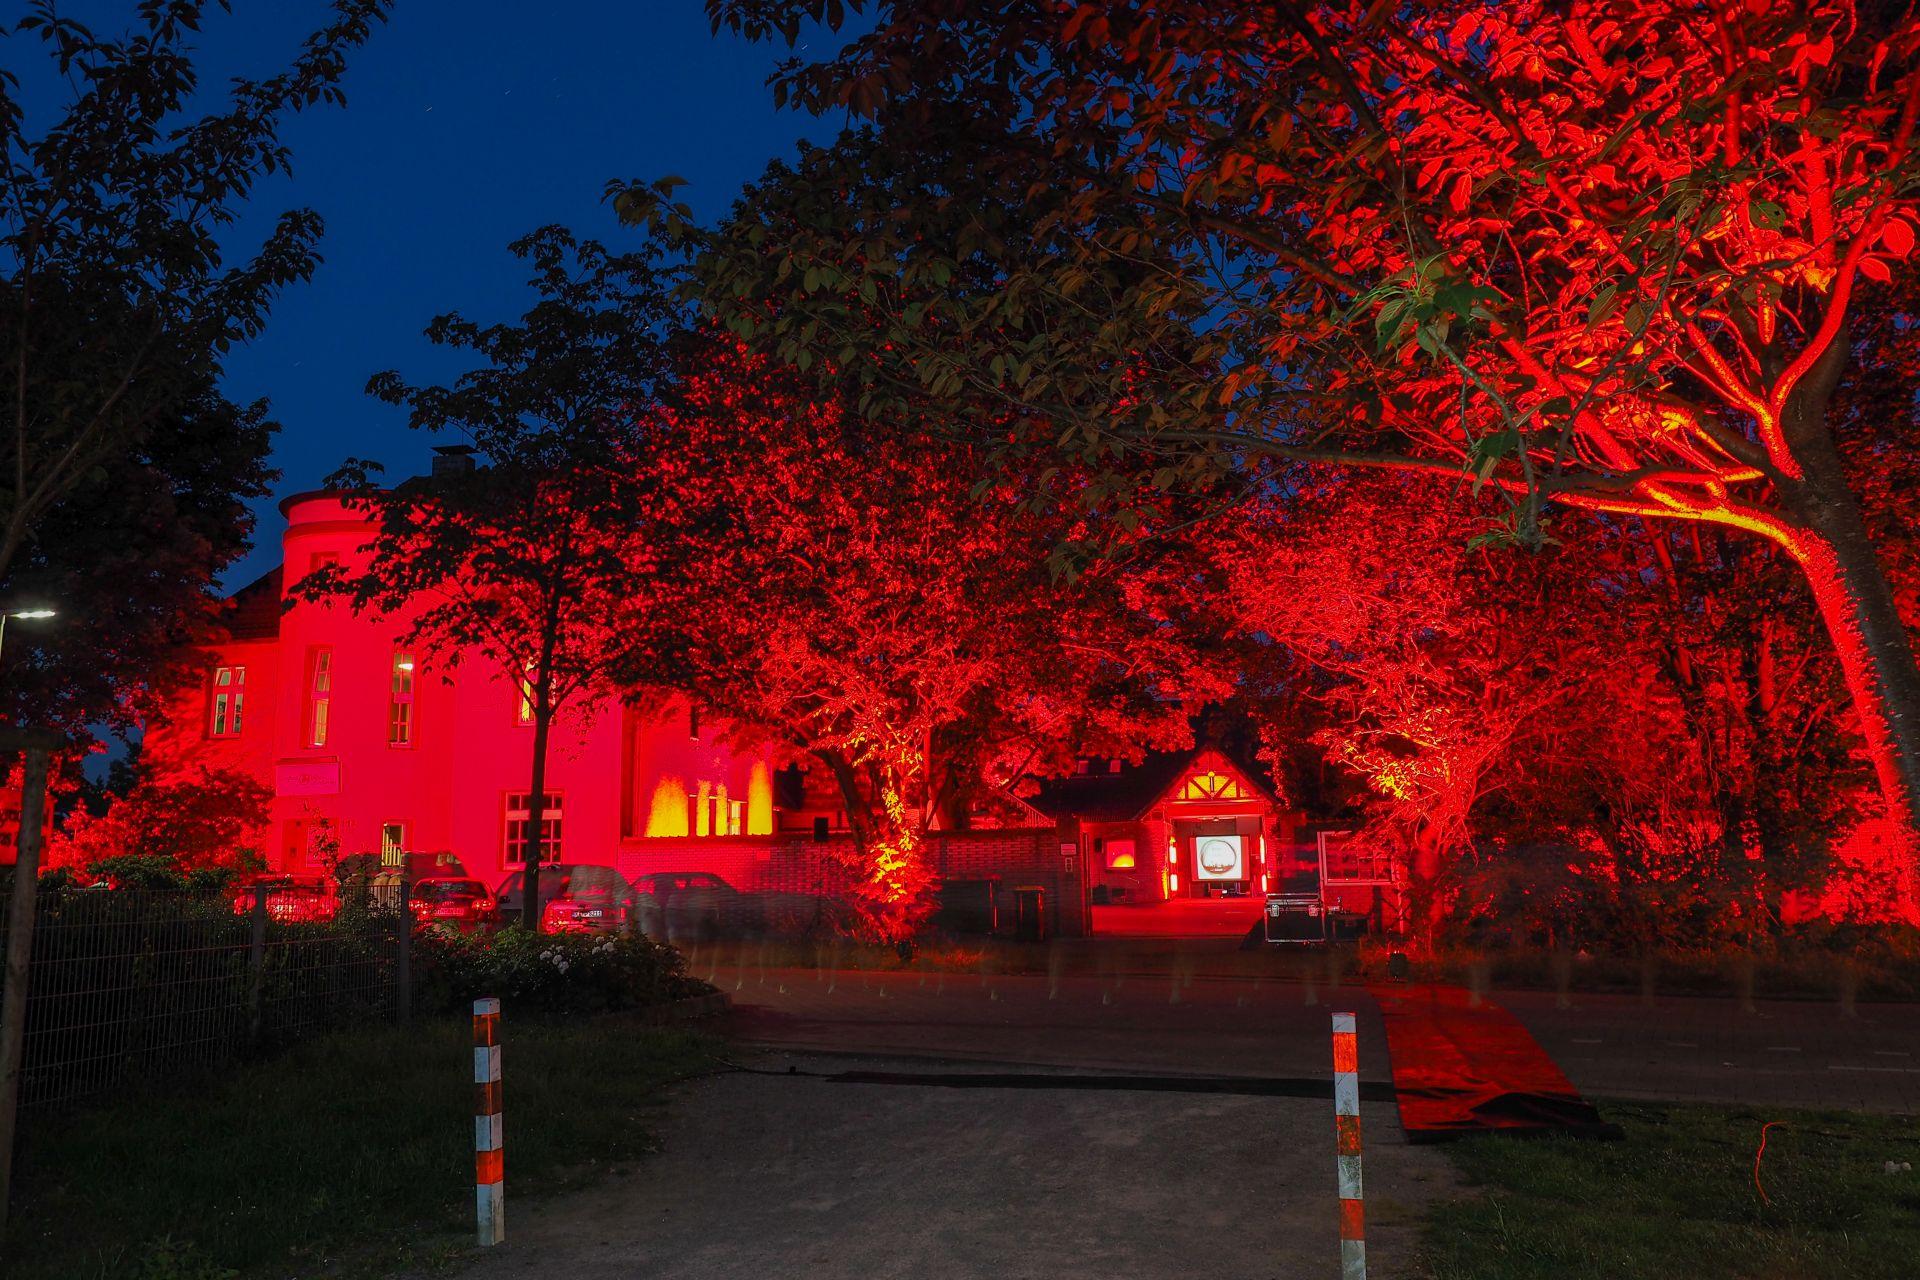 Burghofbühne, Landestheater im Kreis Wesel